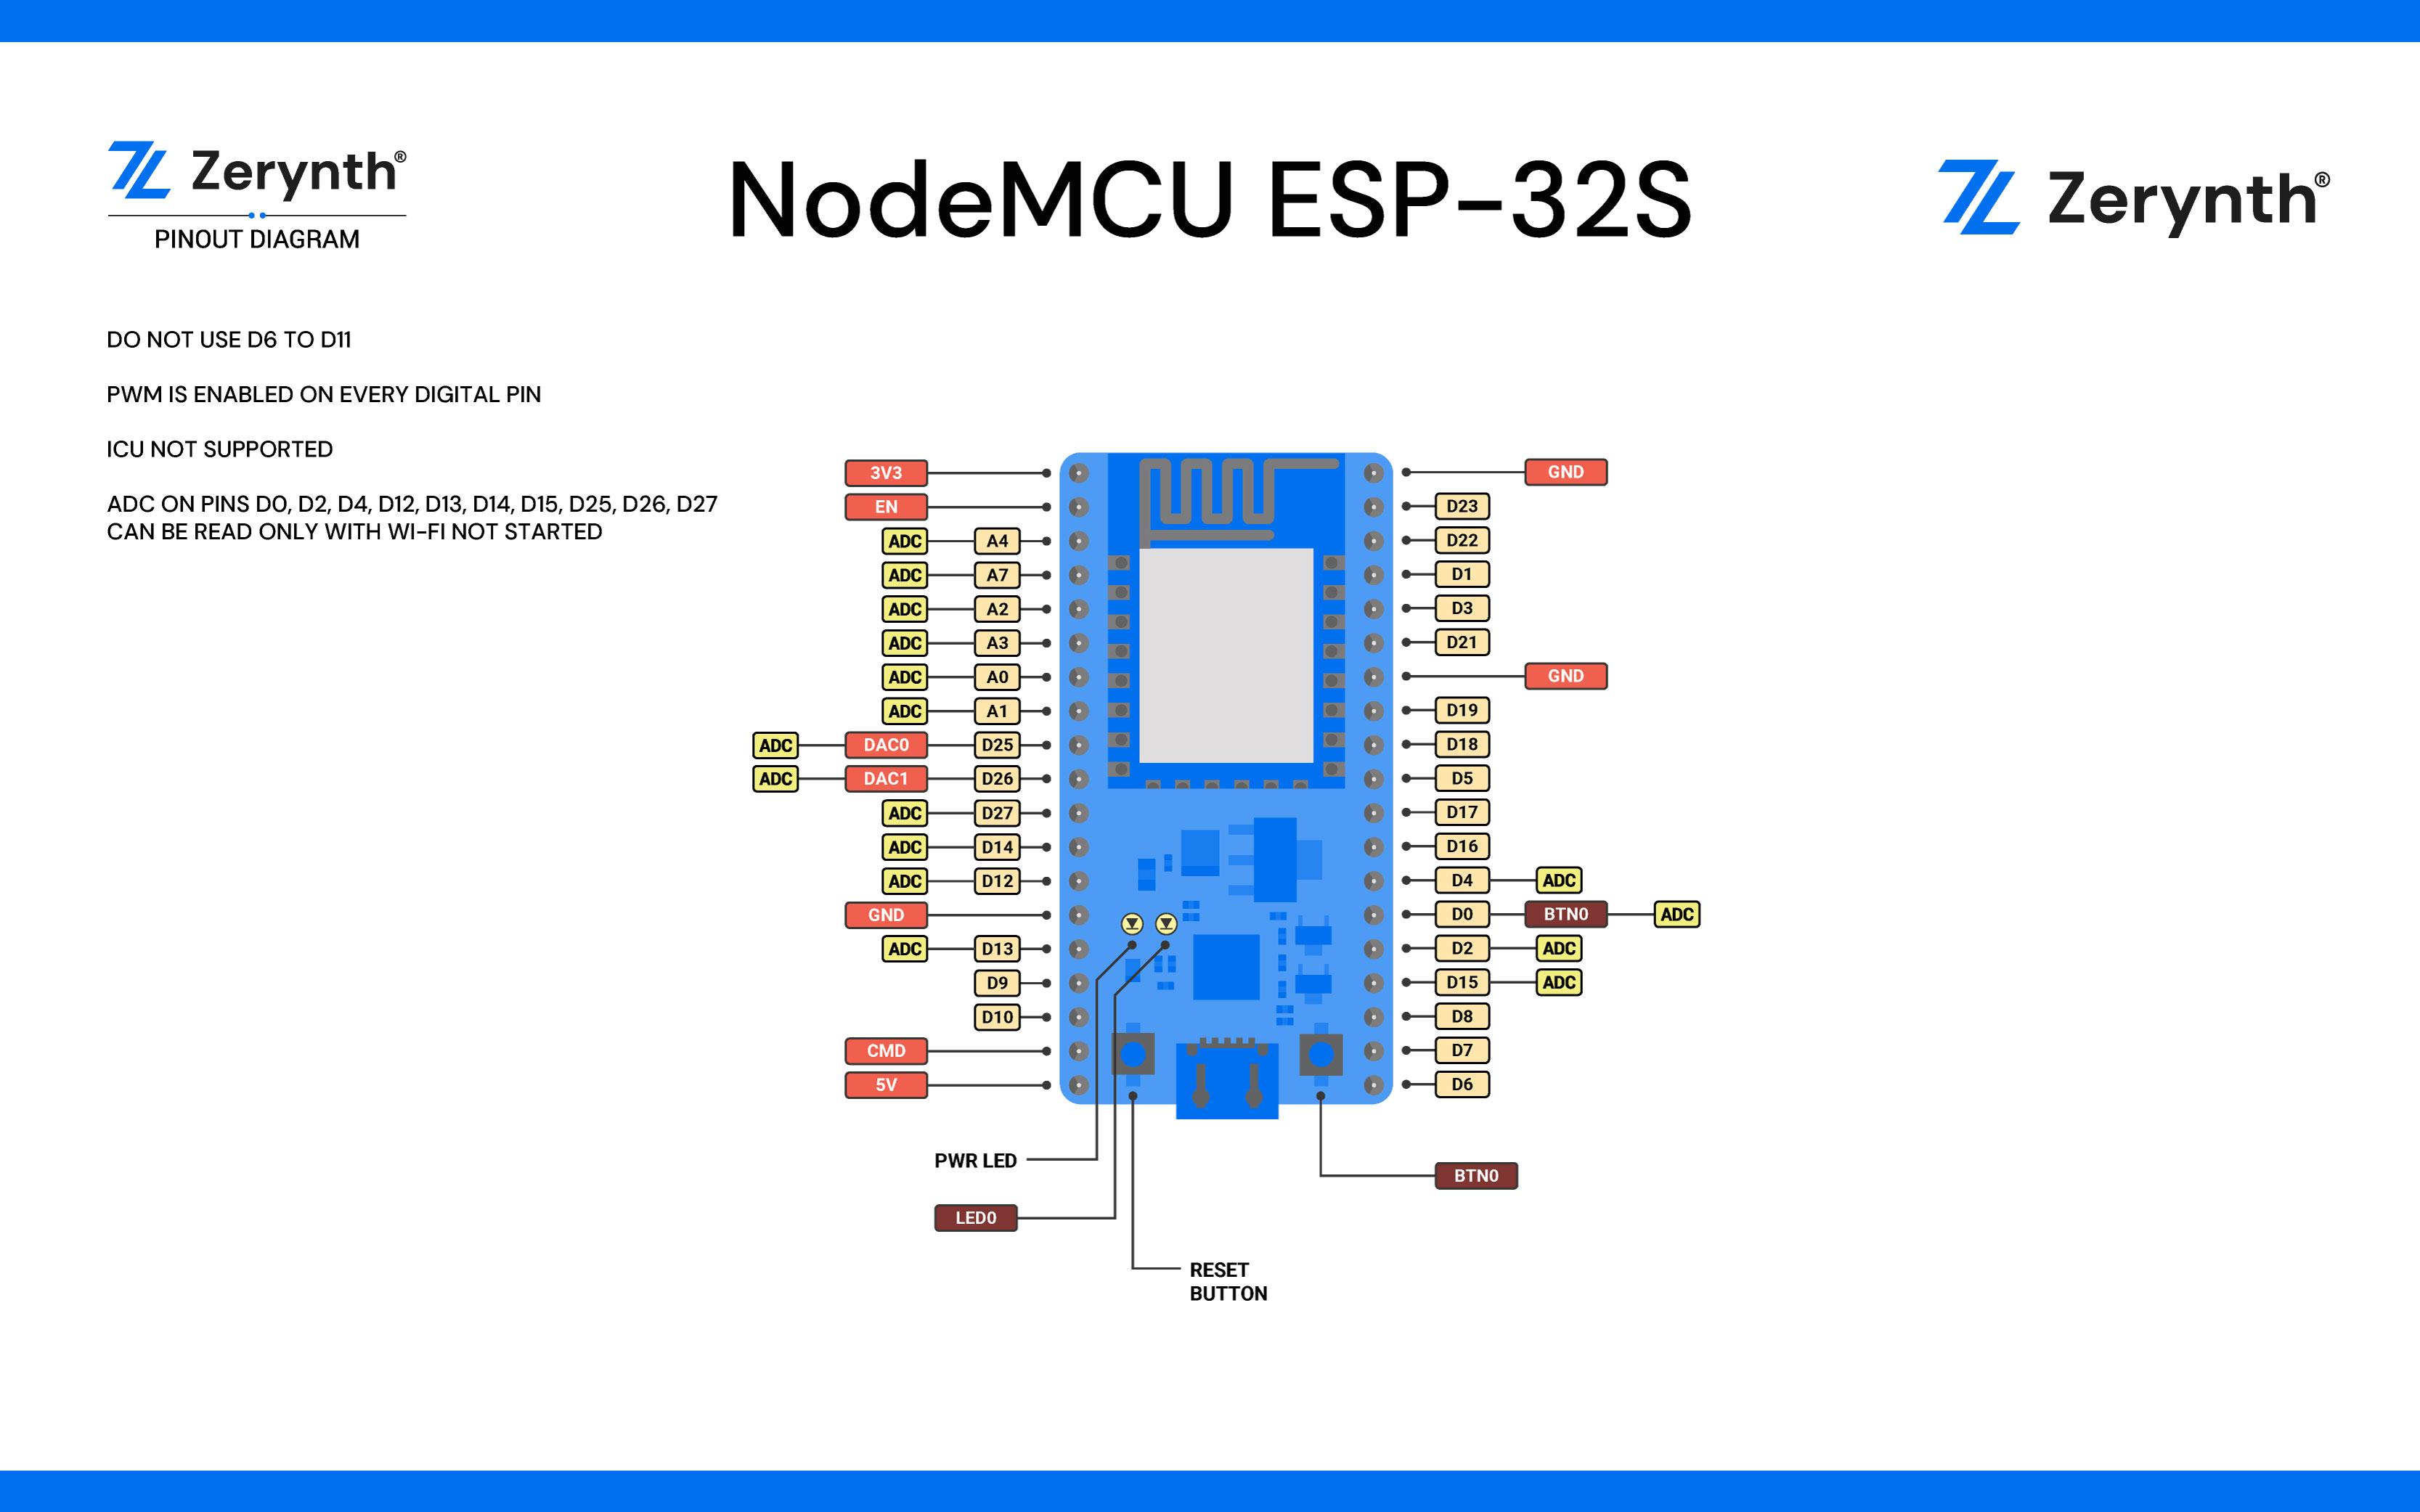 hojas_datos/nodemcu_esp32s/nodemcu_esp32_pin.jpg